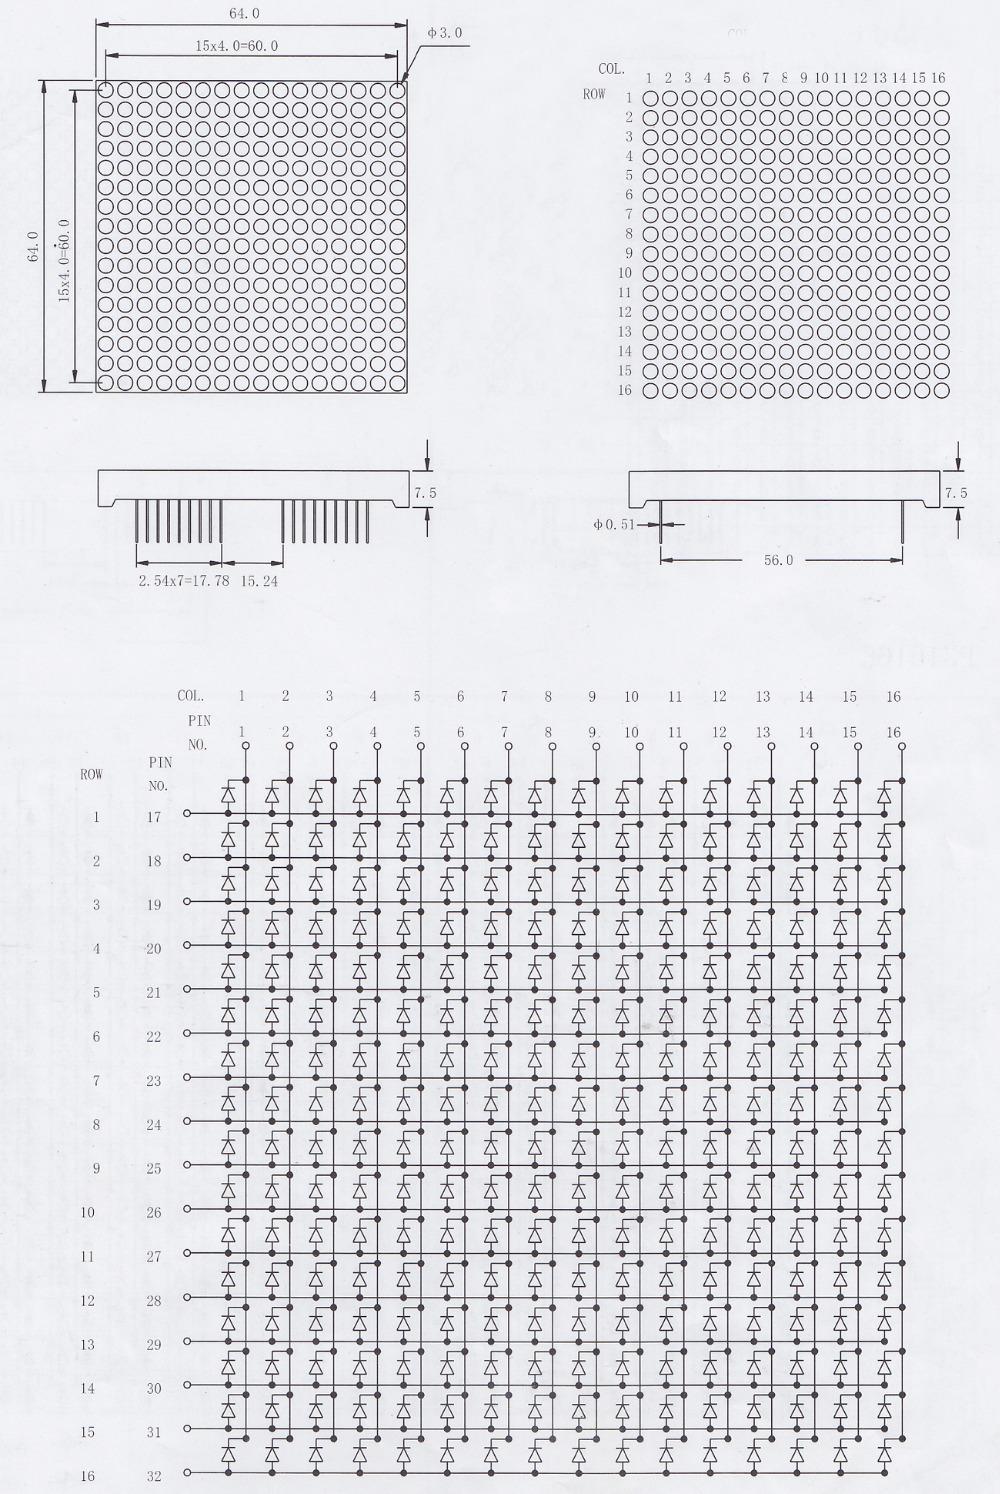 50x50mm Full color 1.8mm dot 16x16 dot matrix led display rgb 16x16 led matrix manufacturer